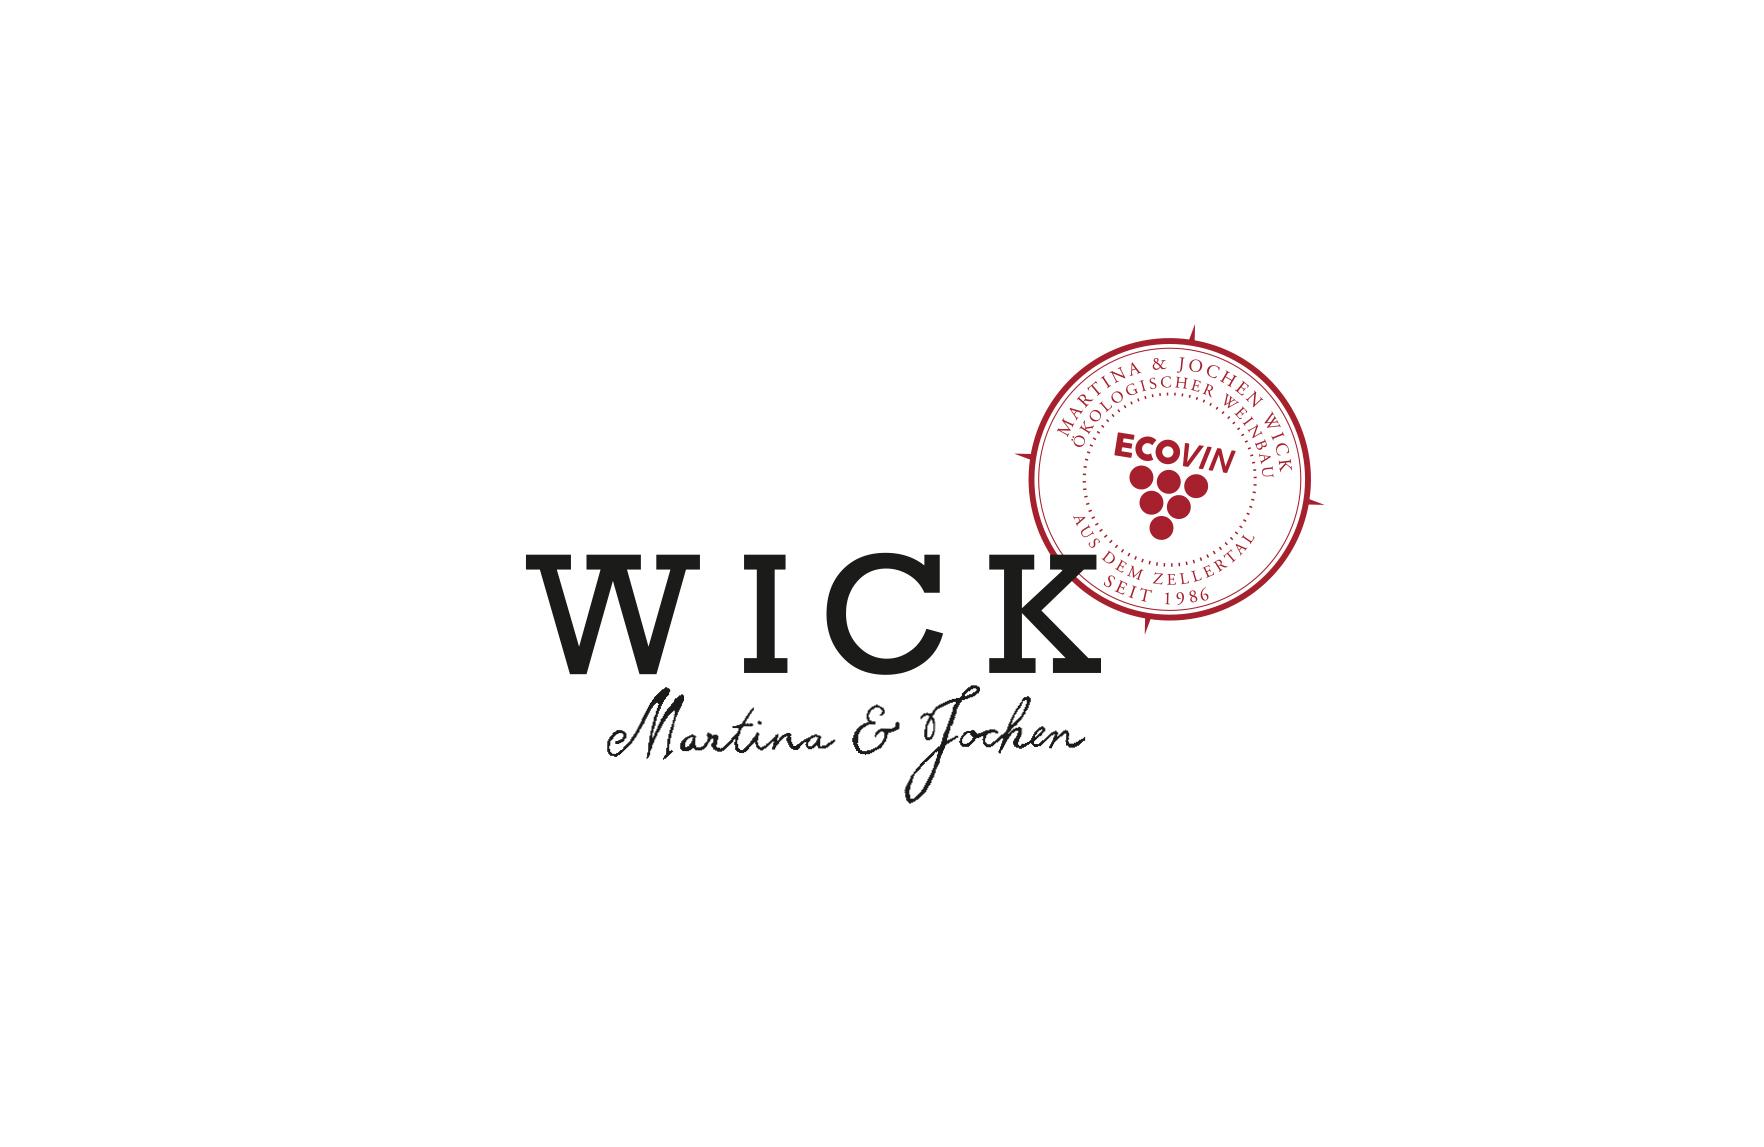 Branding & Produktkommunikation. Weingut Wick